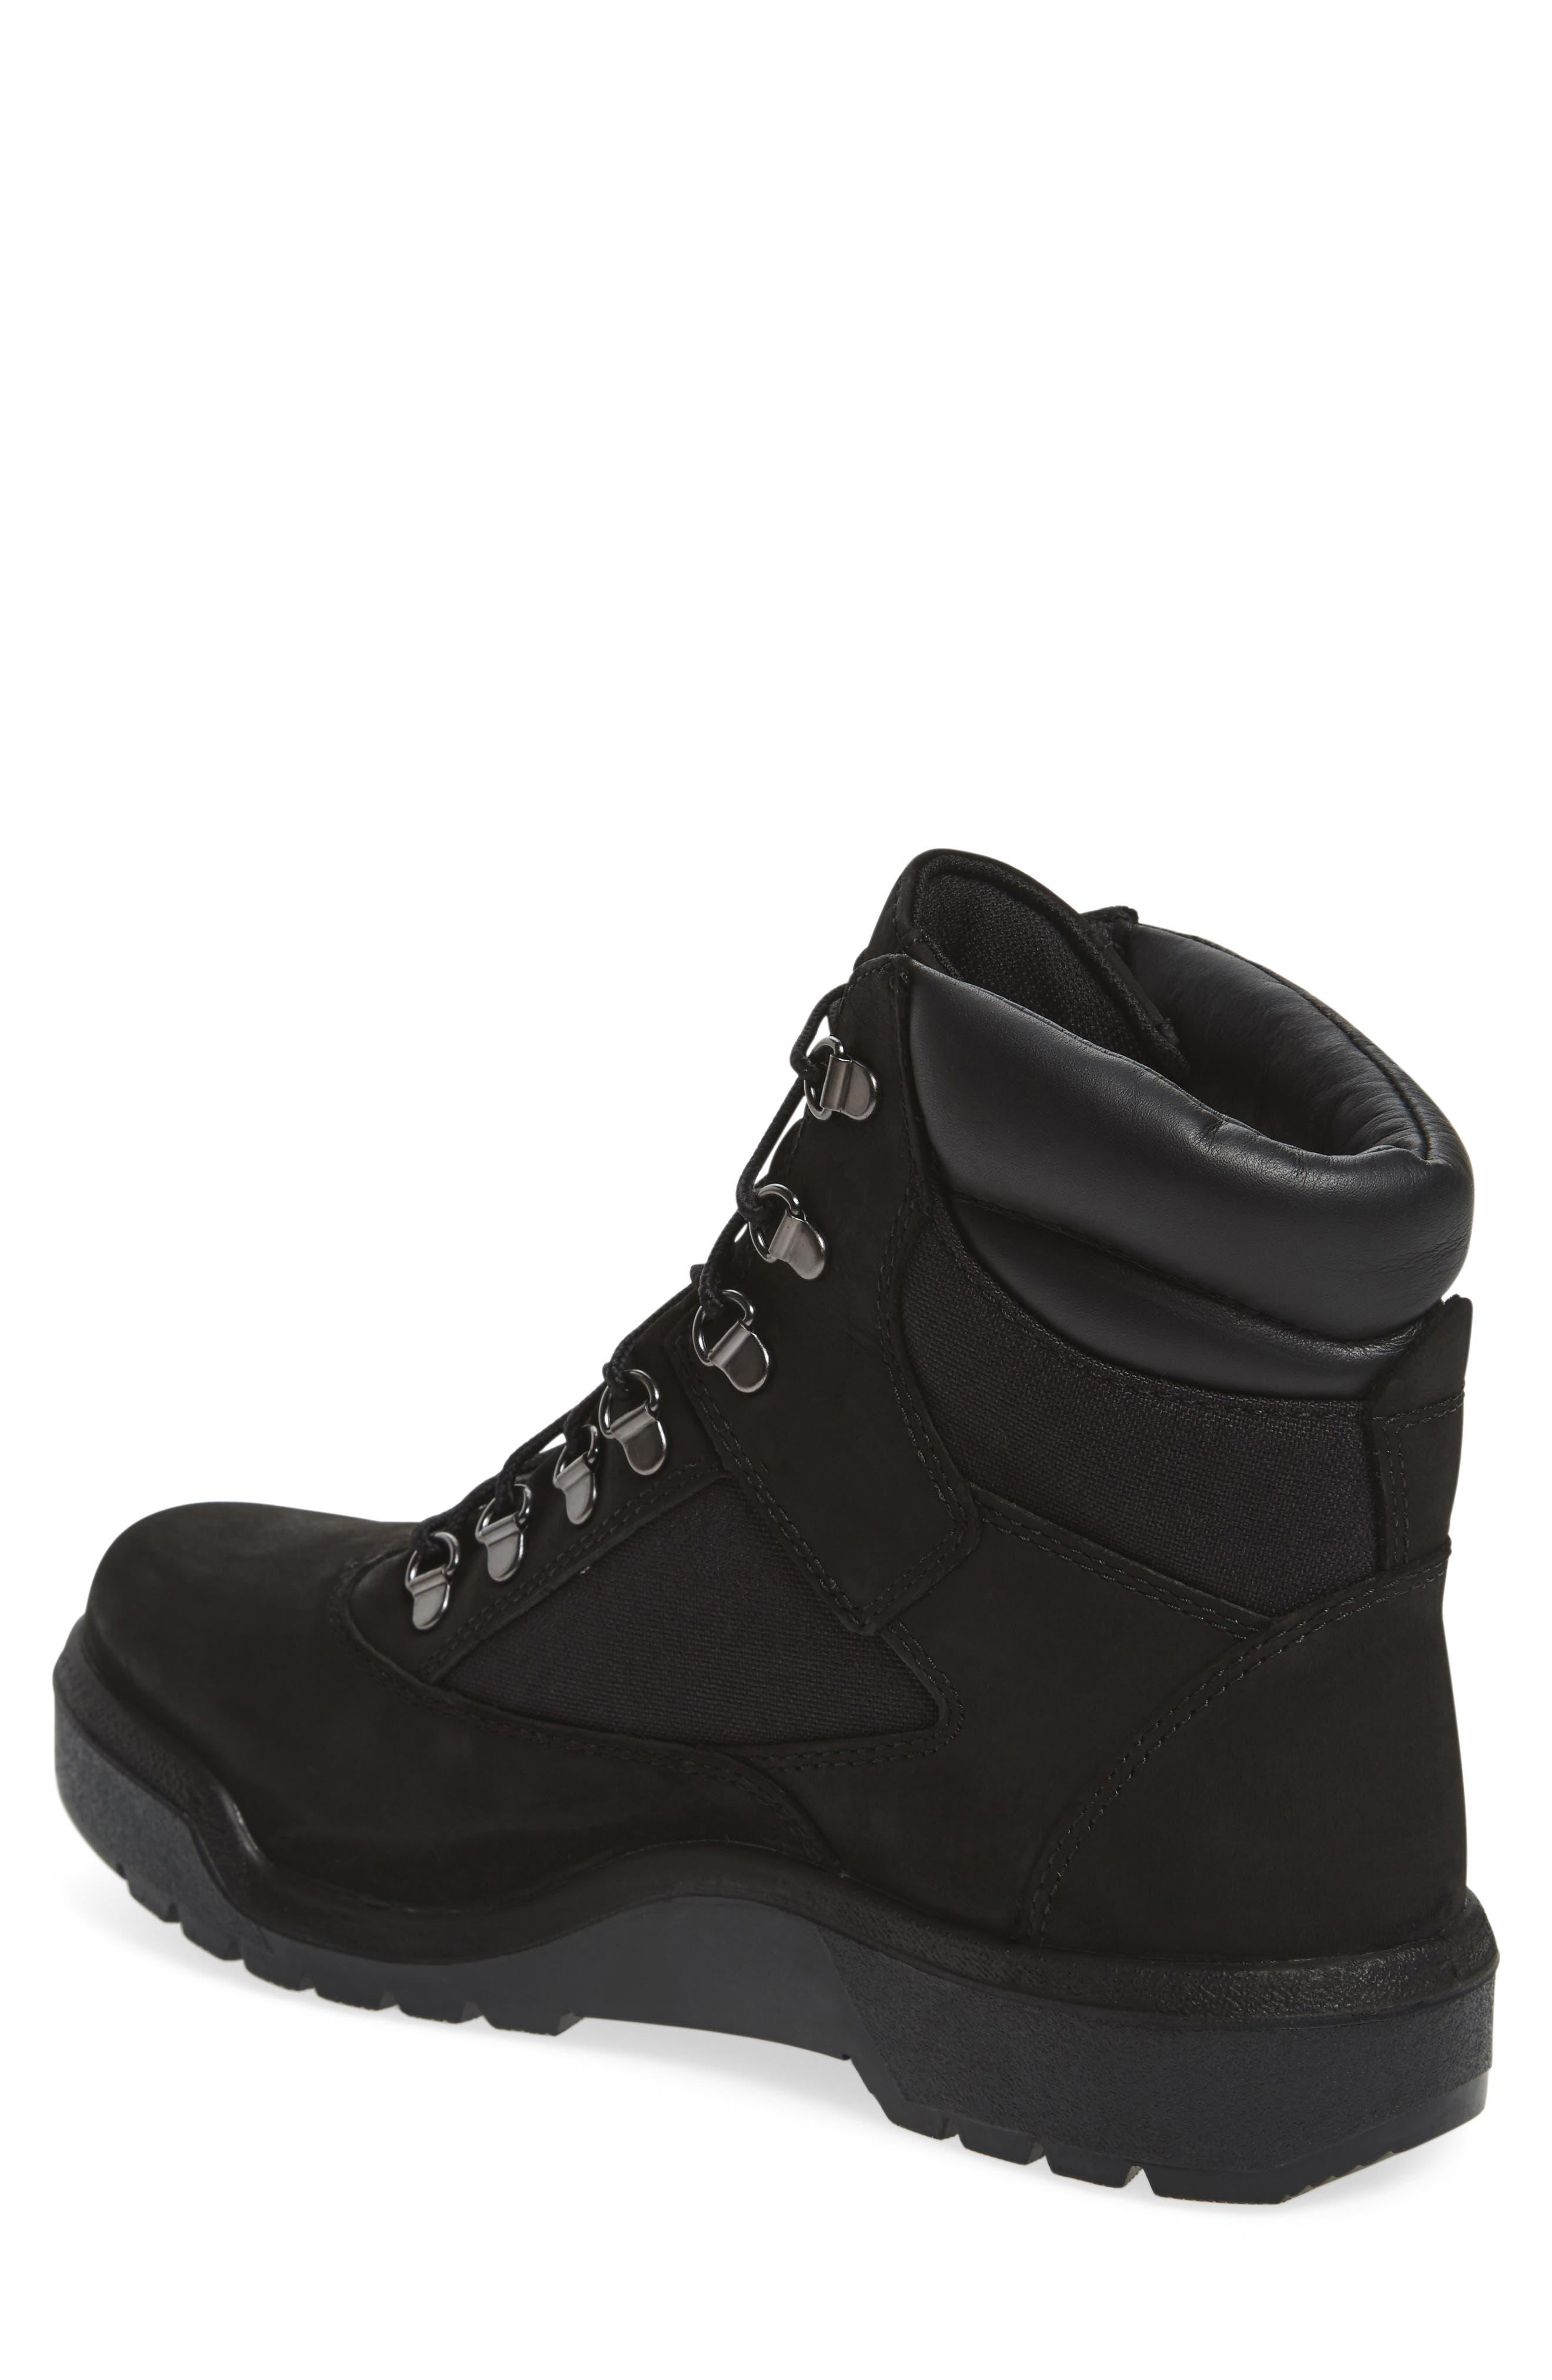 Alternate Image 2  - Timberland Field Waterproof Boot (Men)